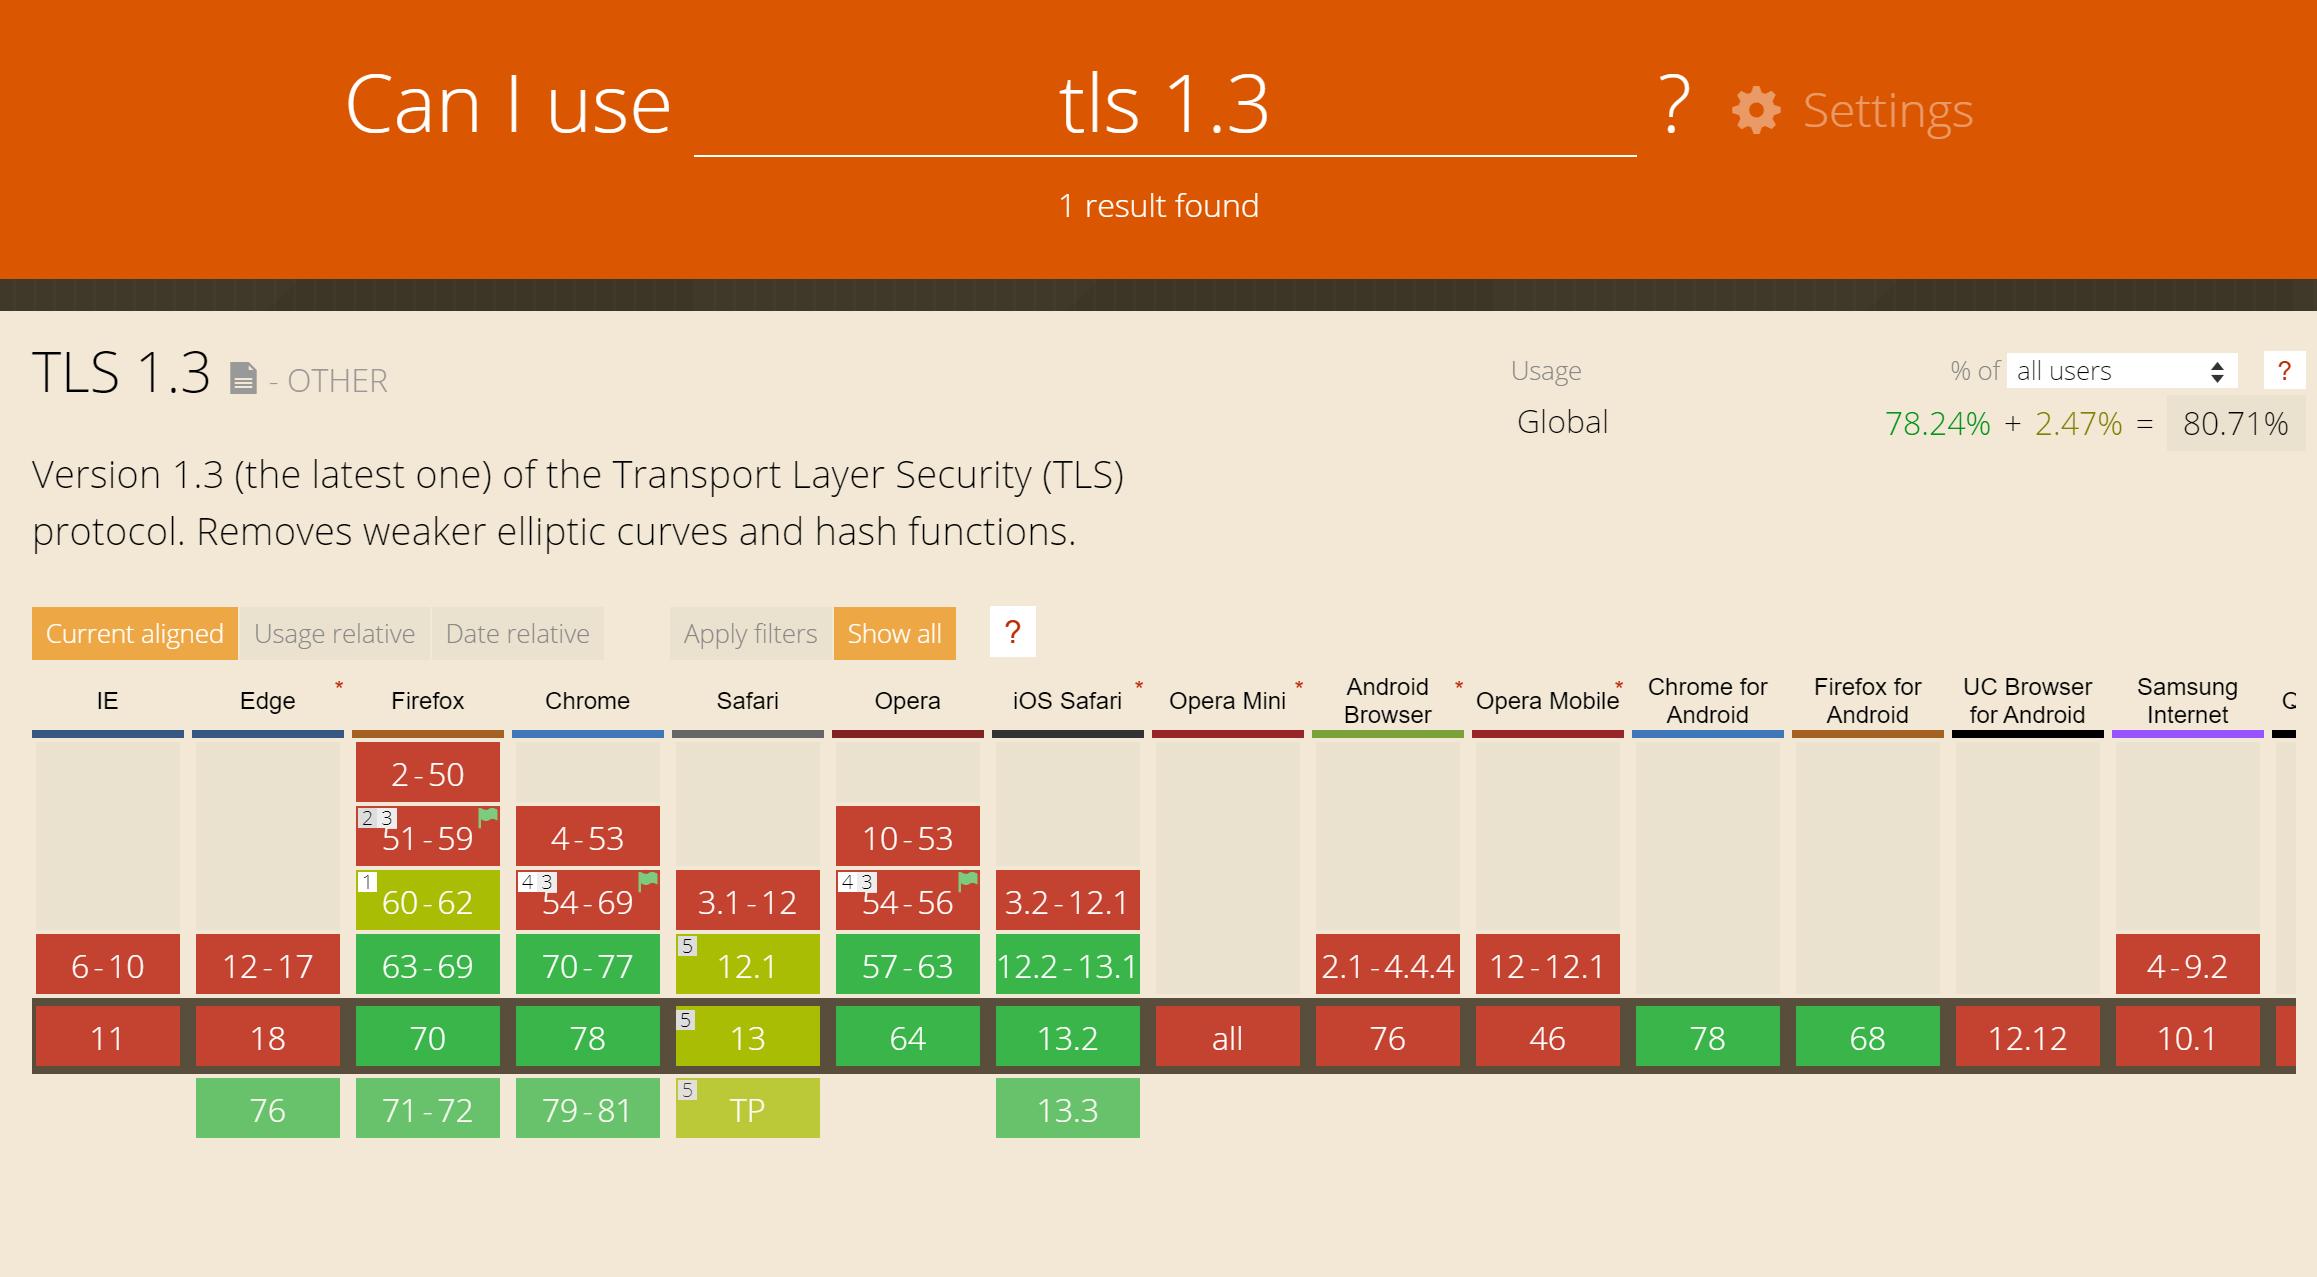 TLS 1.3 usage